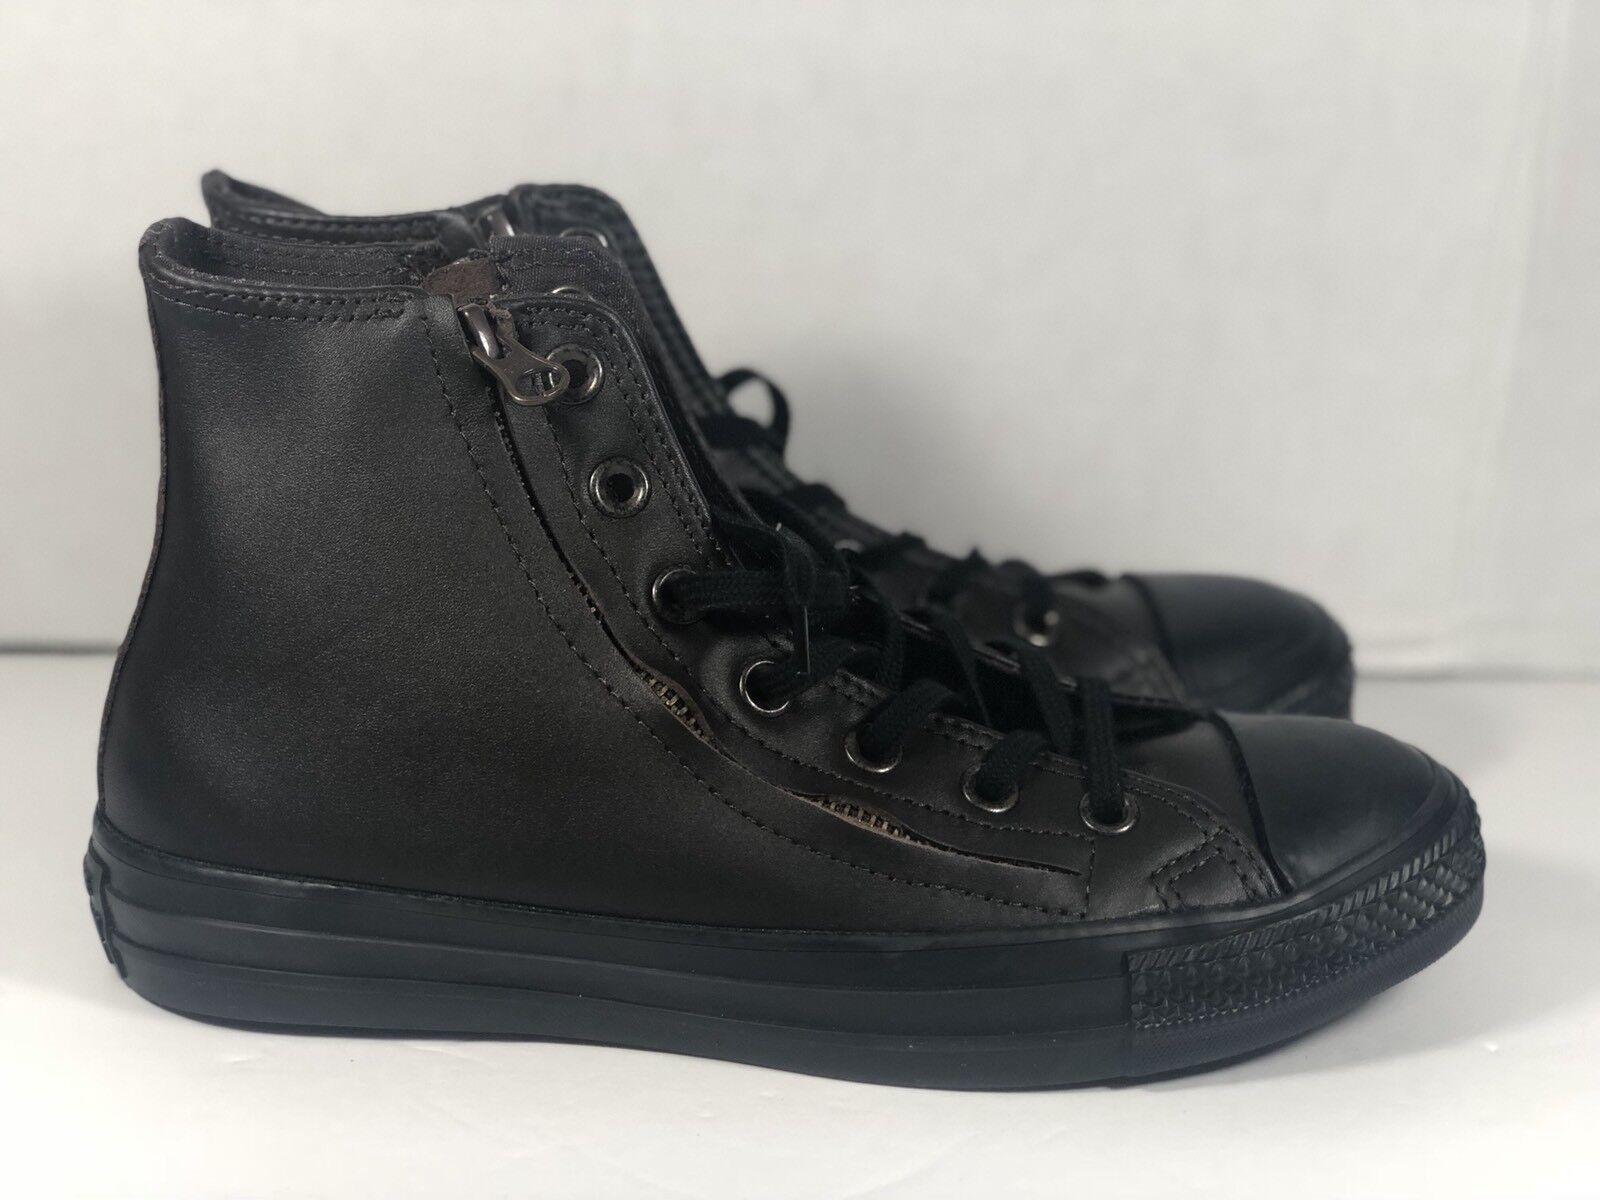 Damens's Converse Chuck Taylor Double Zip Hi High Top Schuhes Größe 8 Braun